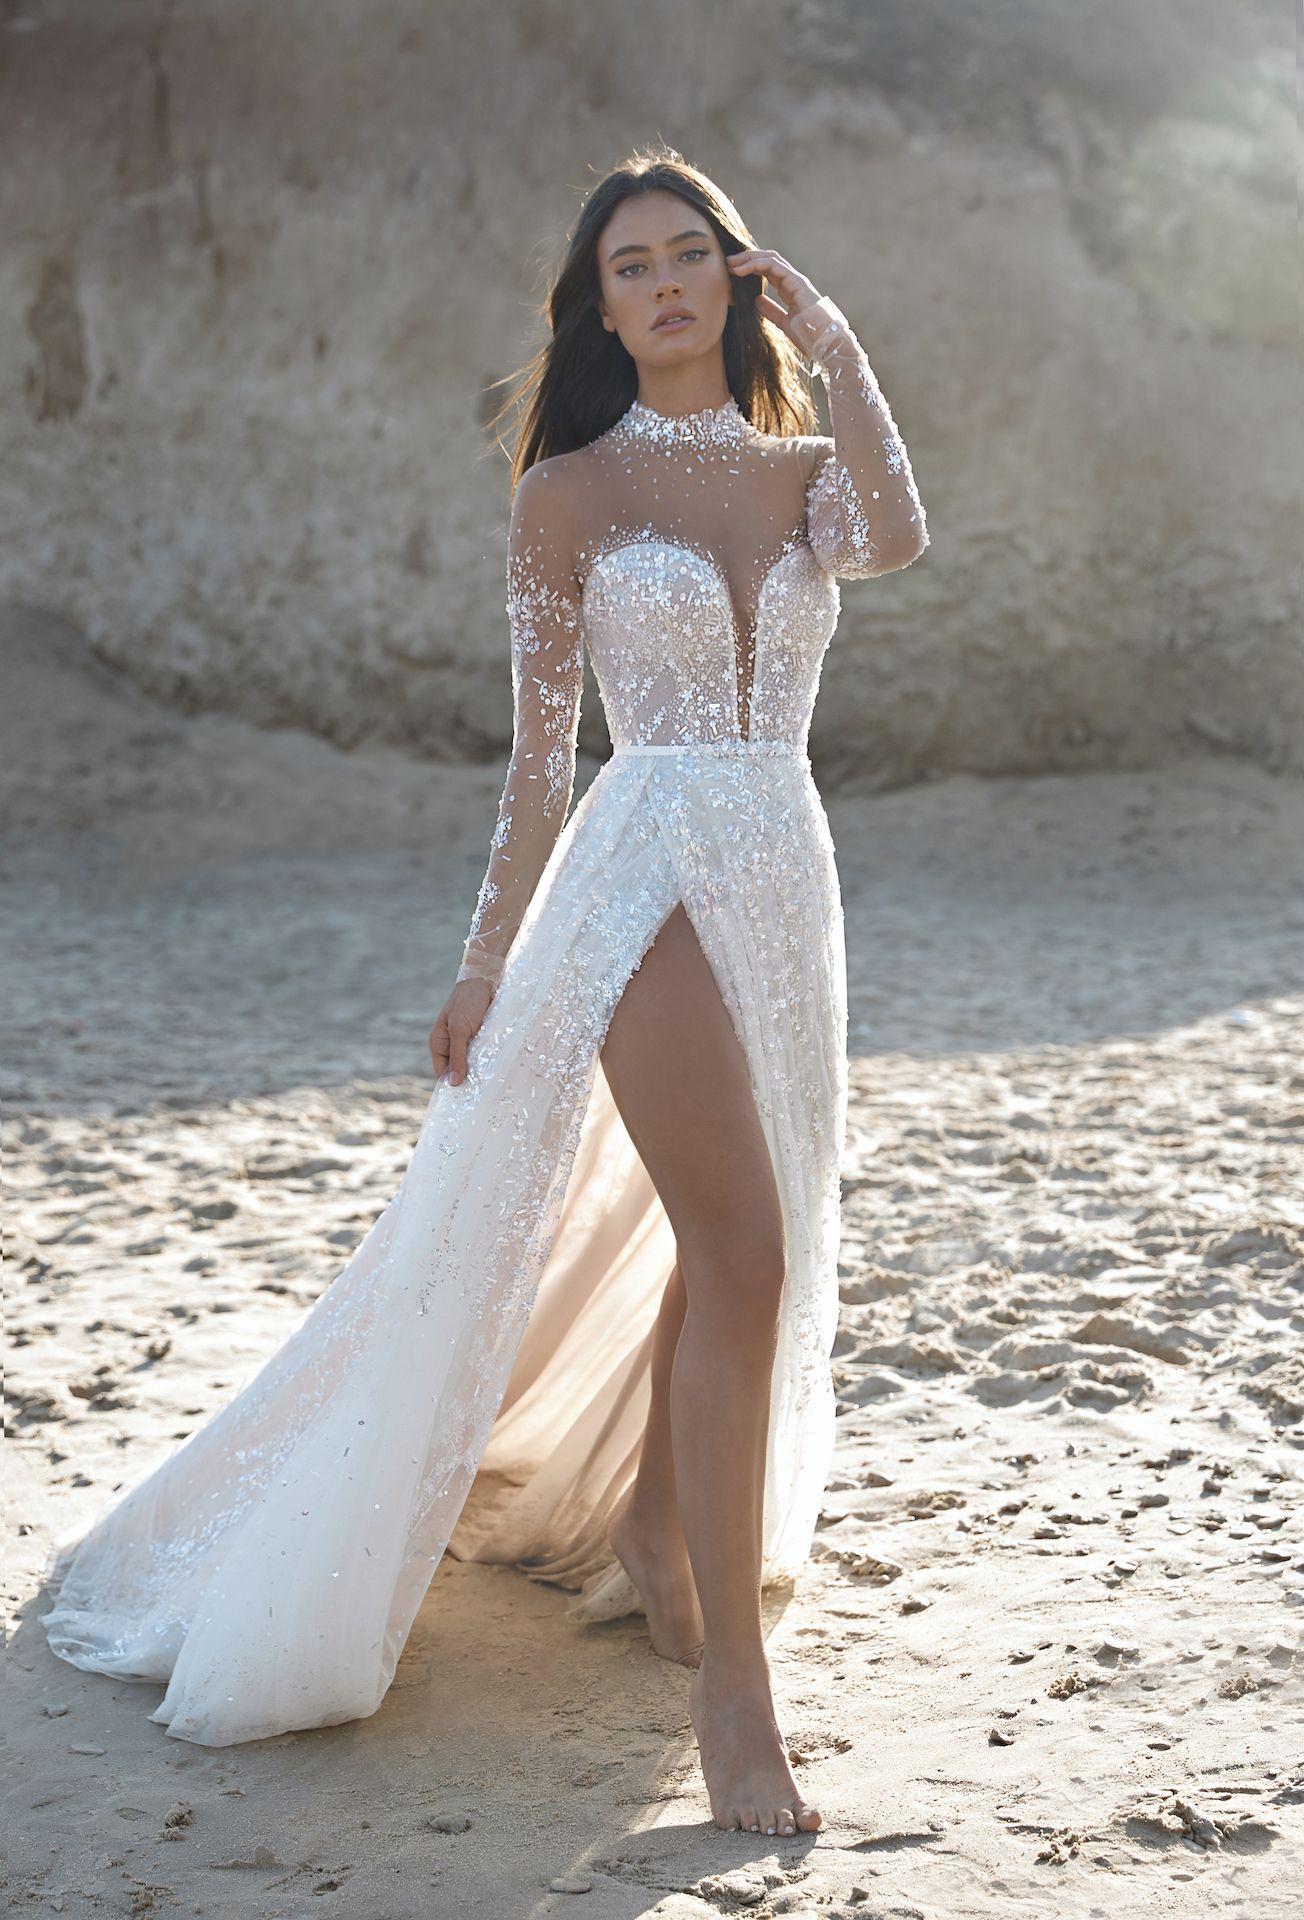 Lee Grebenau Ss2021 Bridal Collection La Belle Epoque Sparkly Wedding Gowns Wedding Dress Couture Sparkly Wedding Dress [ 1920 x 1304 Pixel ]